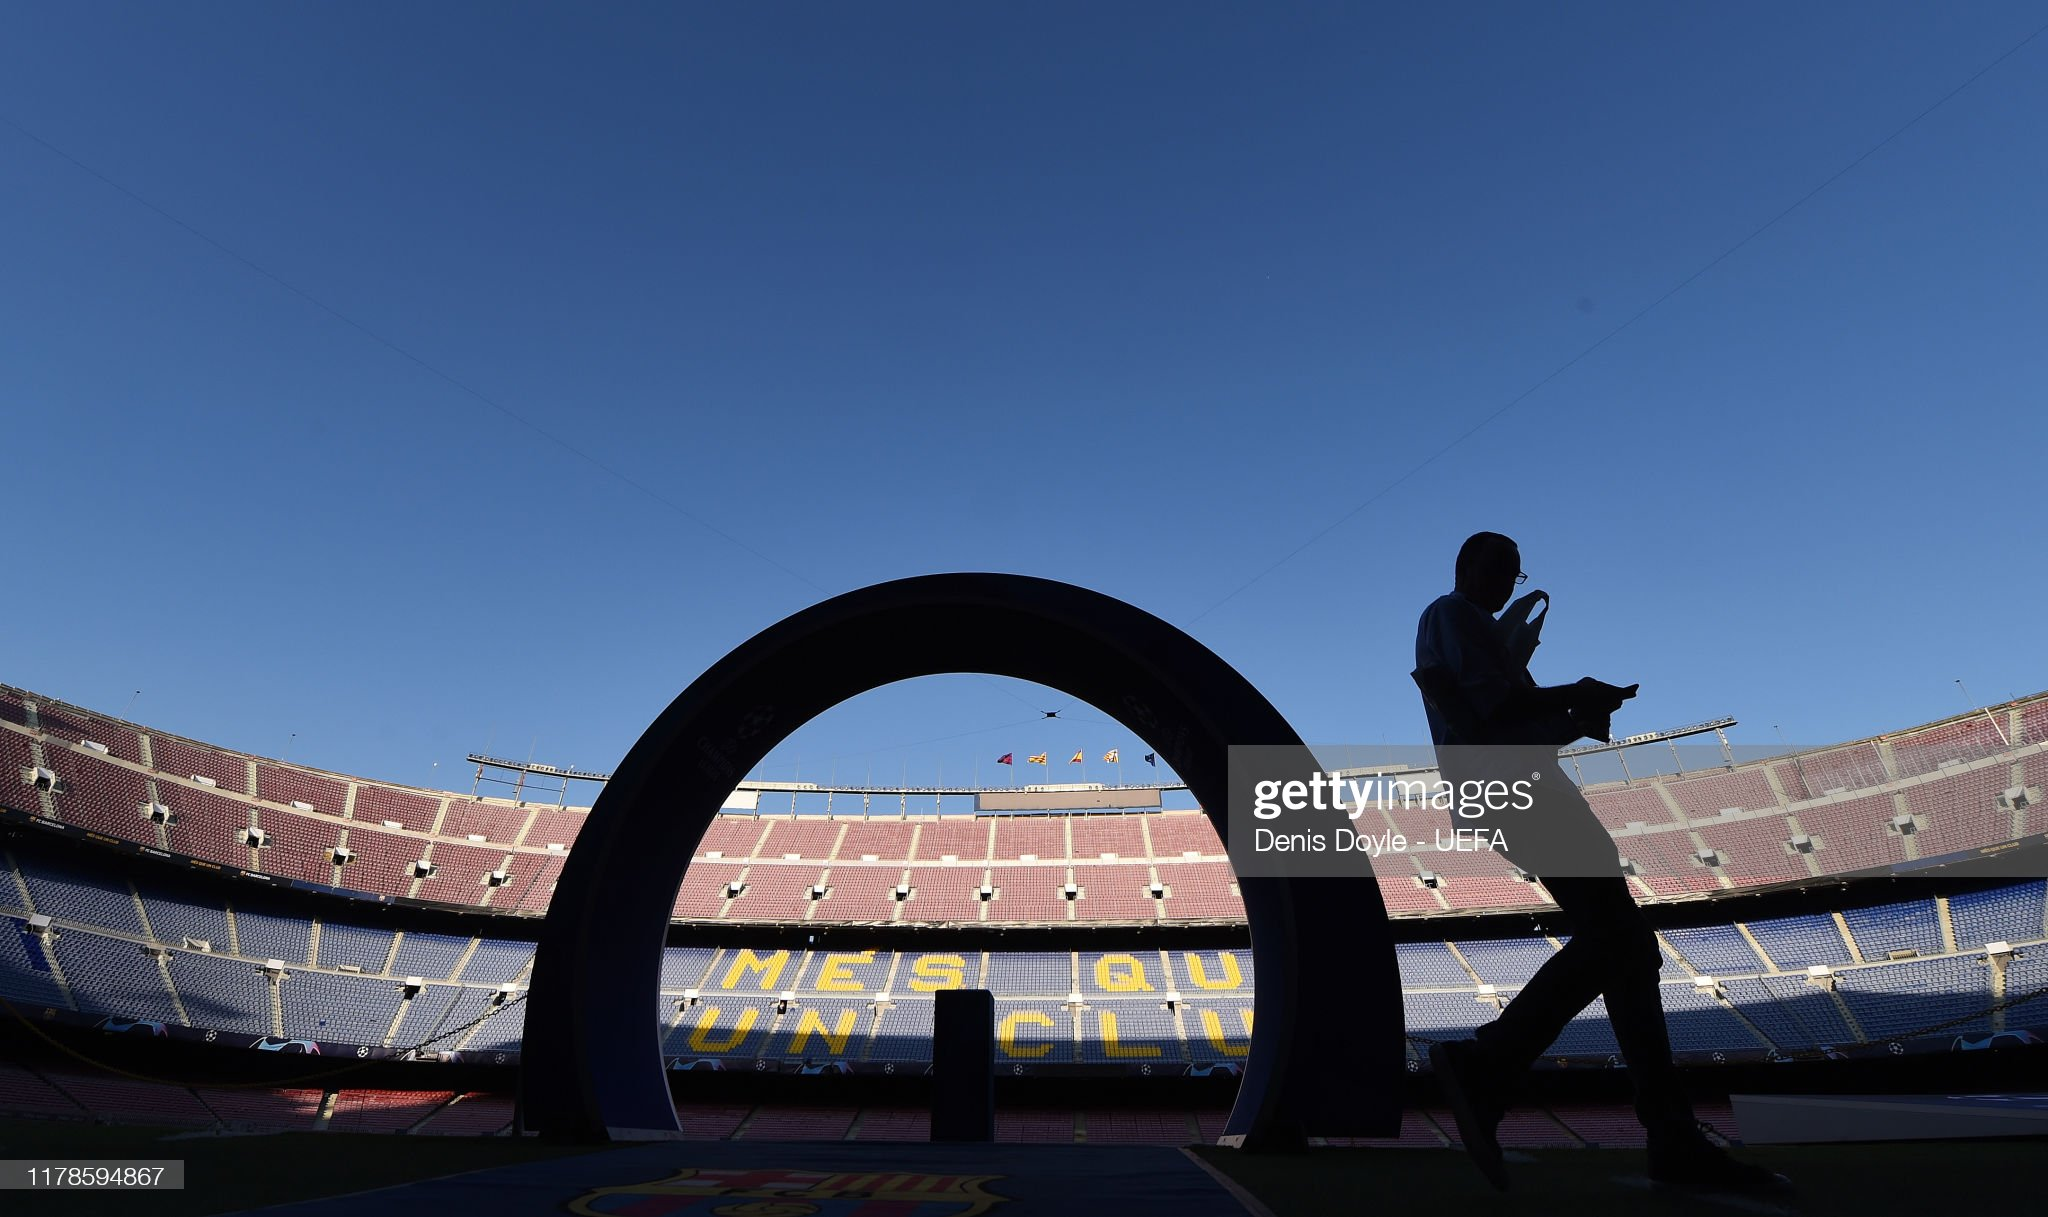 صور مباراة : برشلونة - إنتر 2-1 ( 02-10-2019 )  General-view-of-the-camp-nou-stadium-ahead-of-the-uefa-champions-f-picture-id1178594867?s=2048x2048